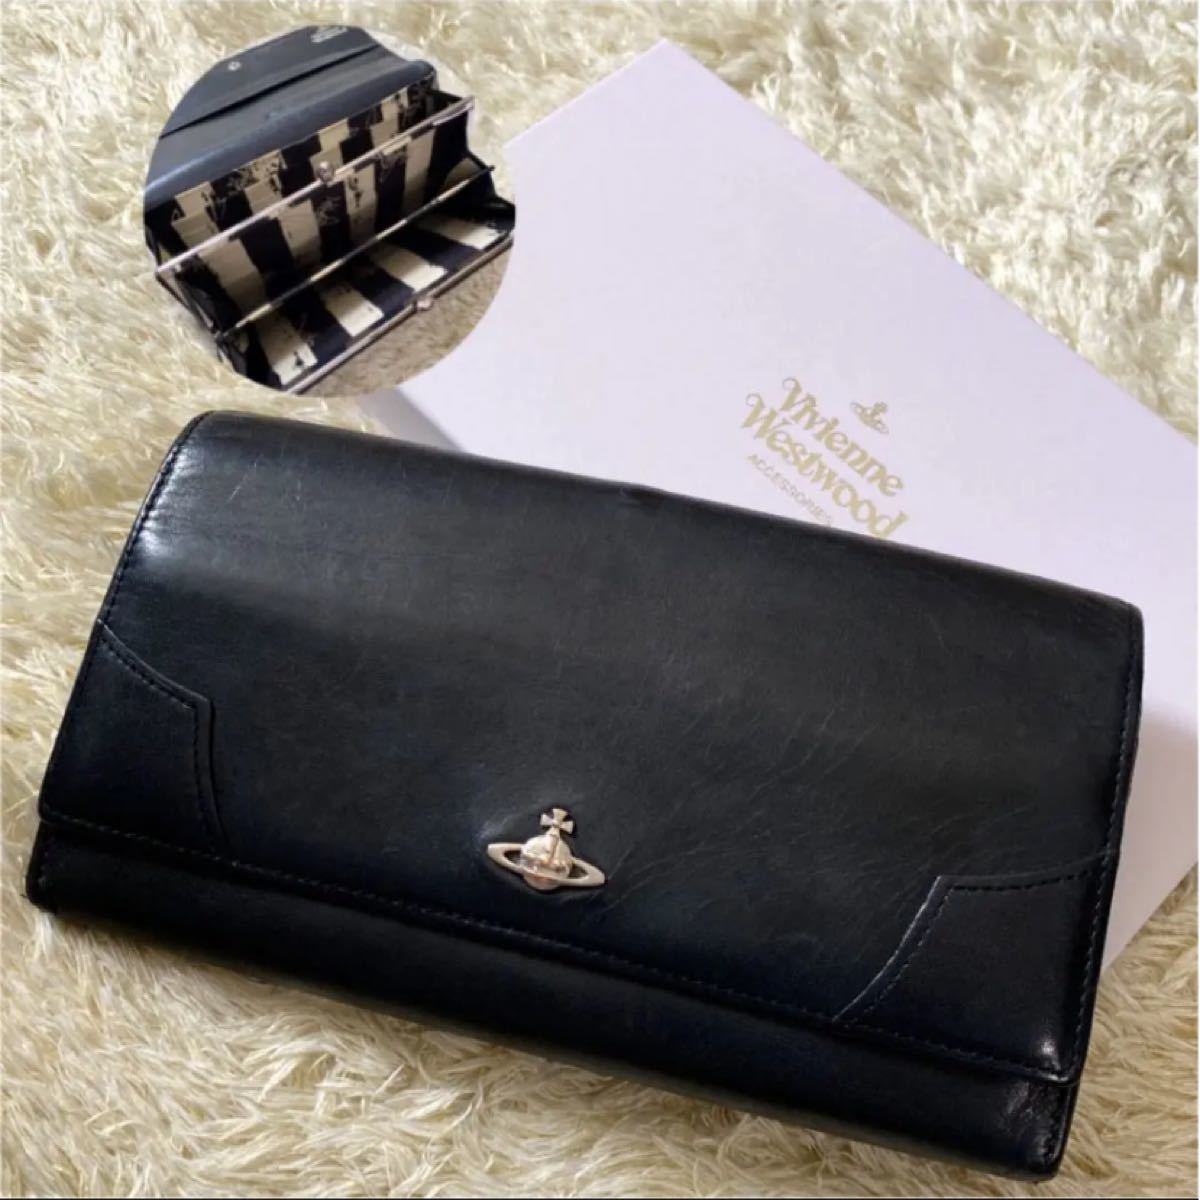 Vivienne Westwood ヴィヴィアンウエストウッド 二つ折り 長財布 がま口 オーブ レザー  ブラック 黒